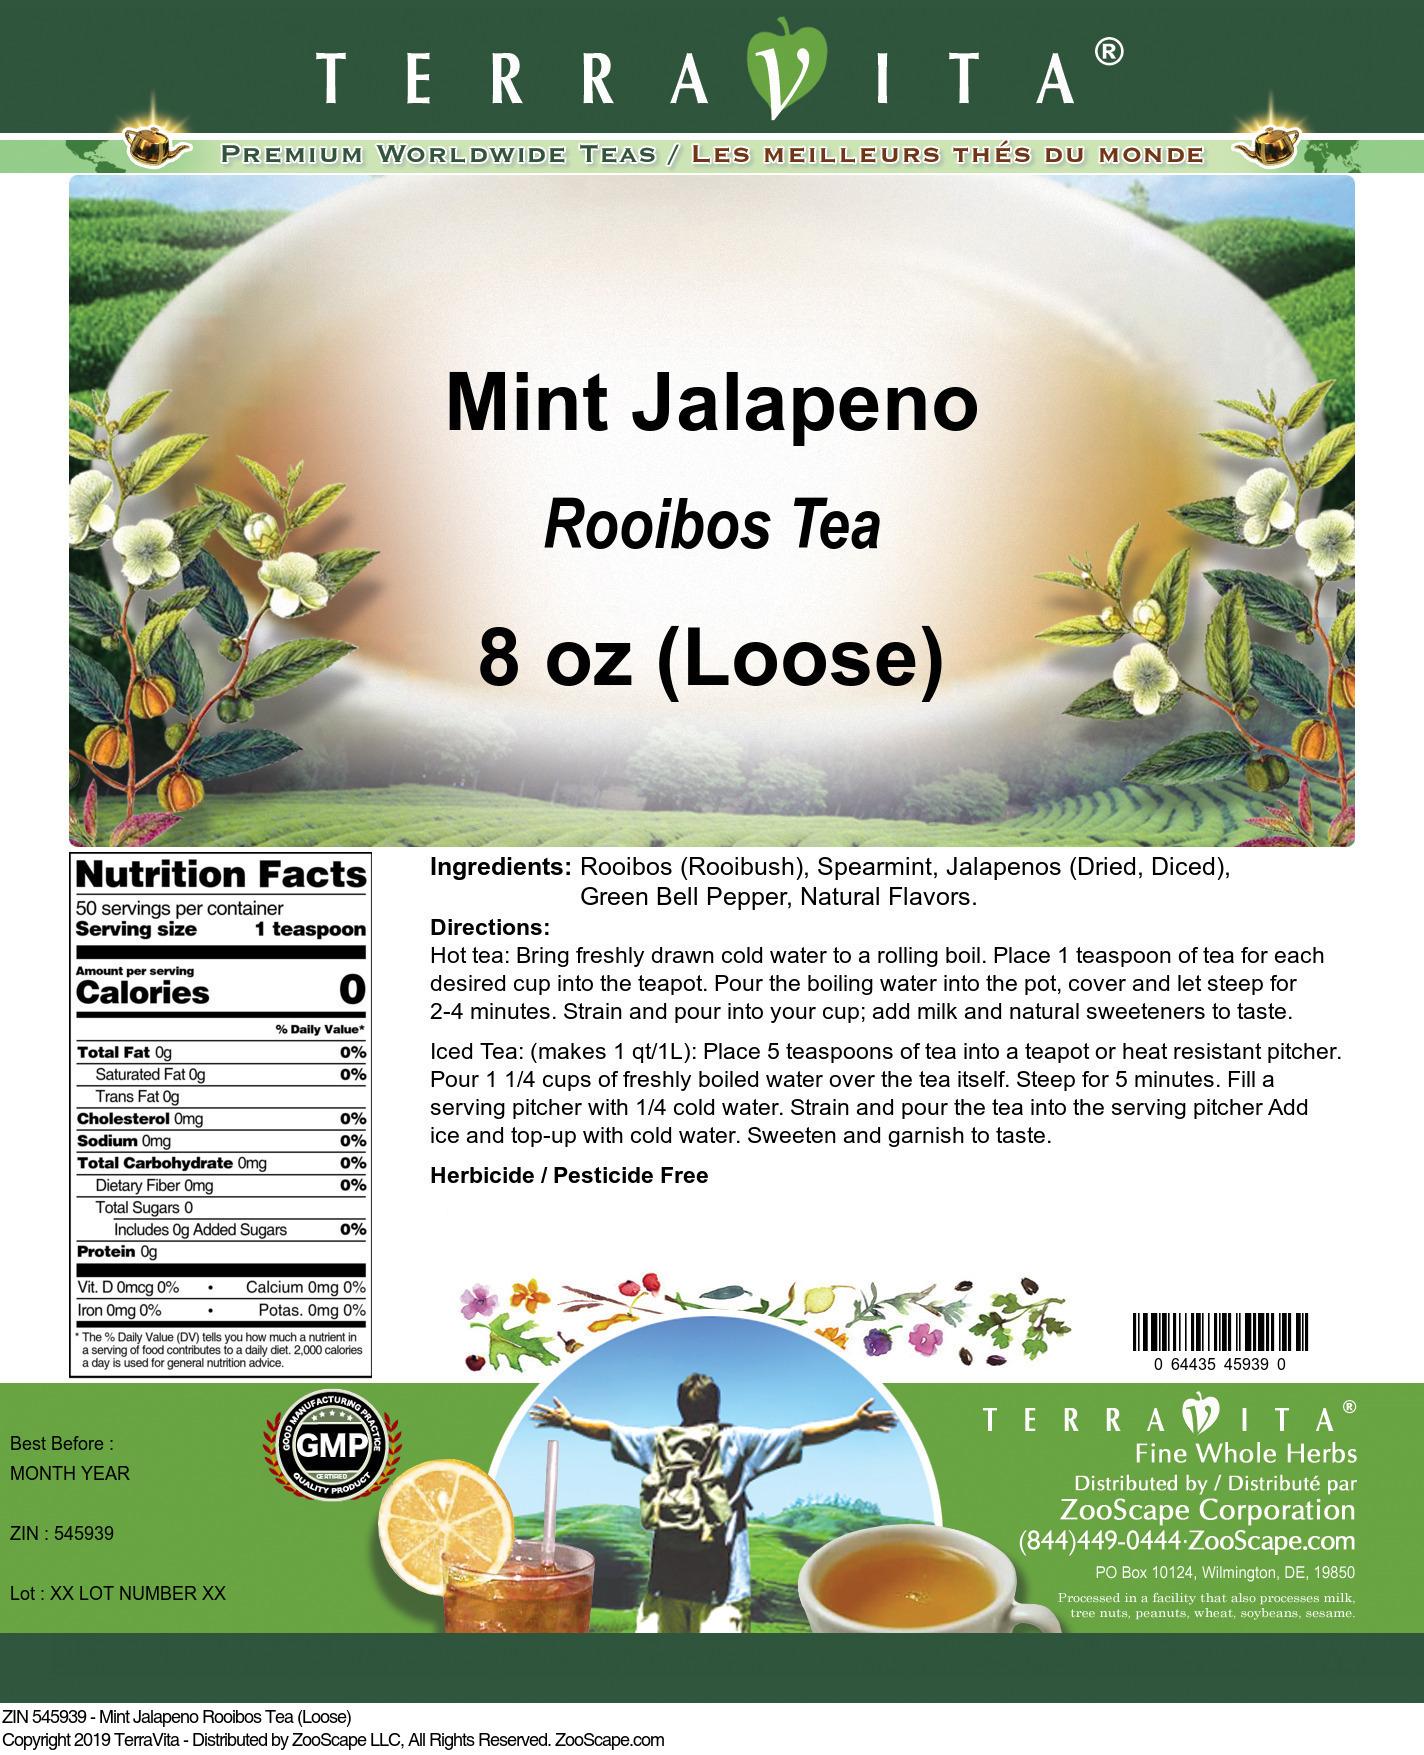 Mint Jalapeno Rooibos Tea (Loose)